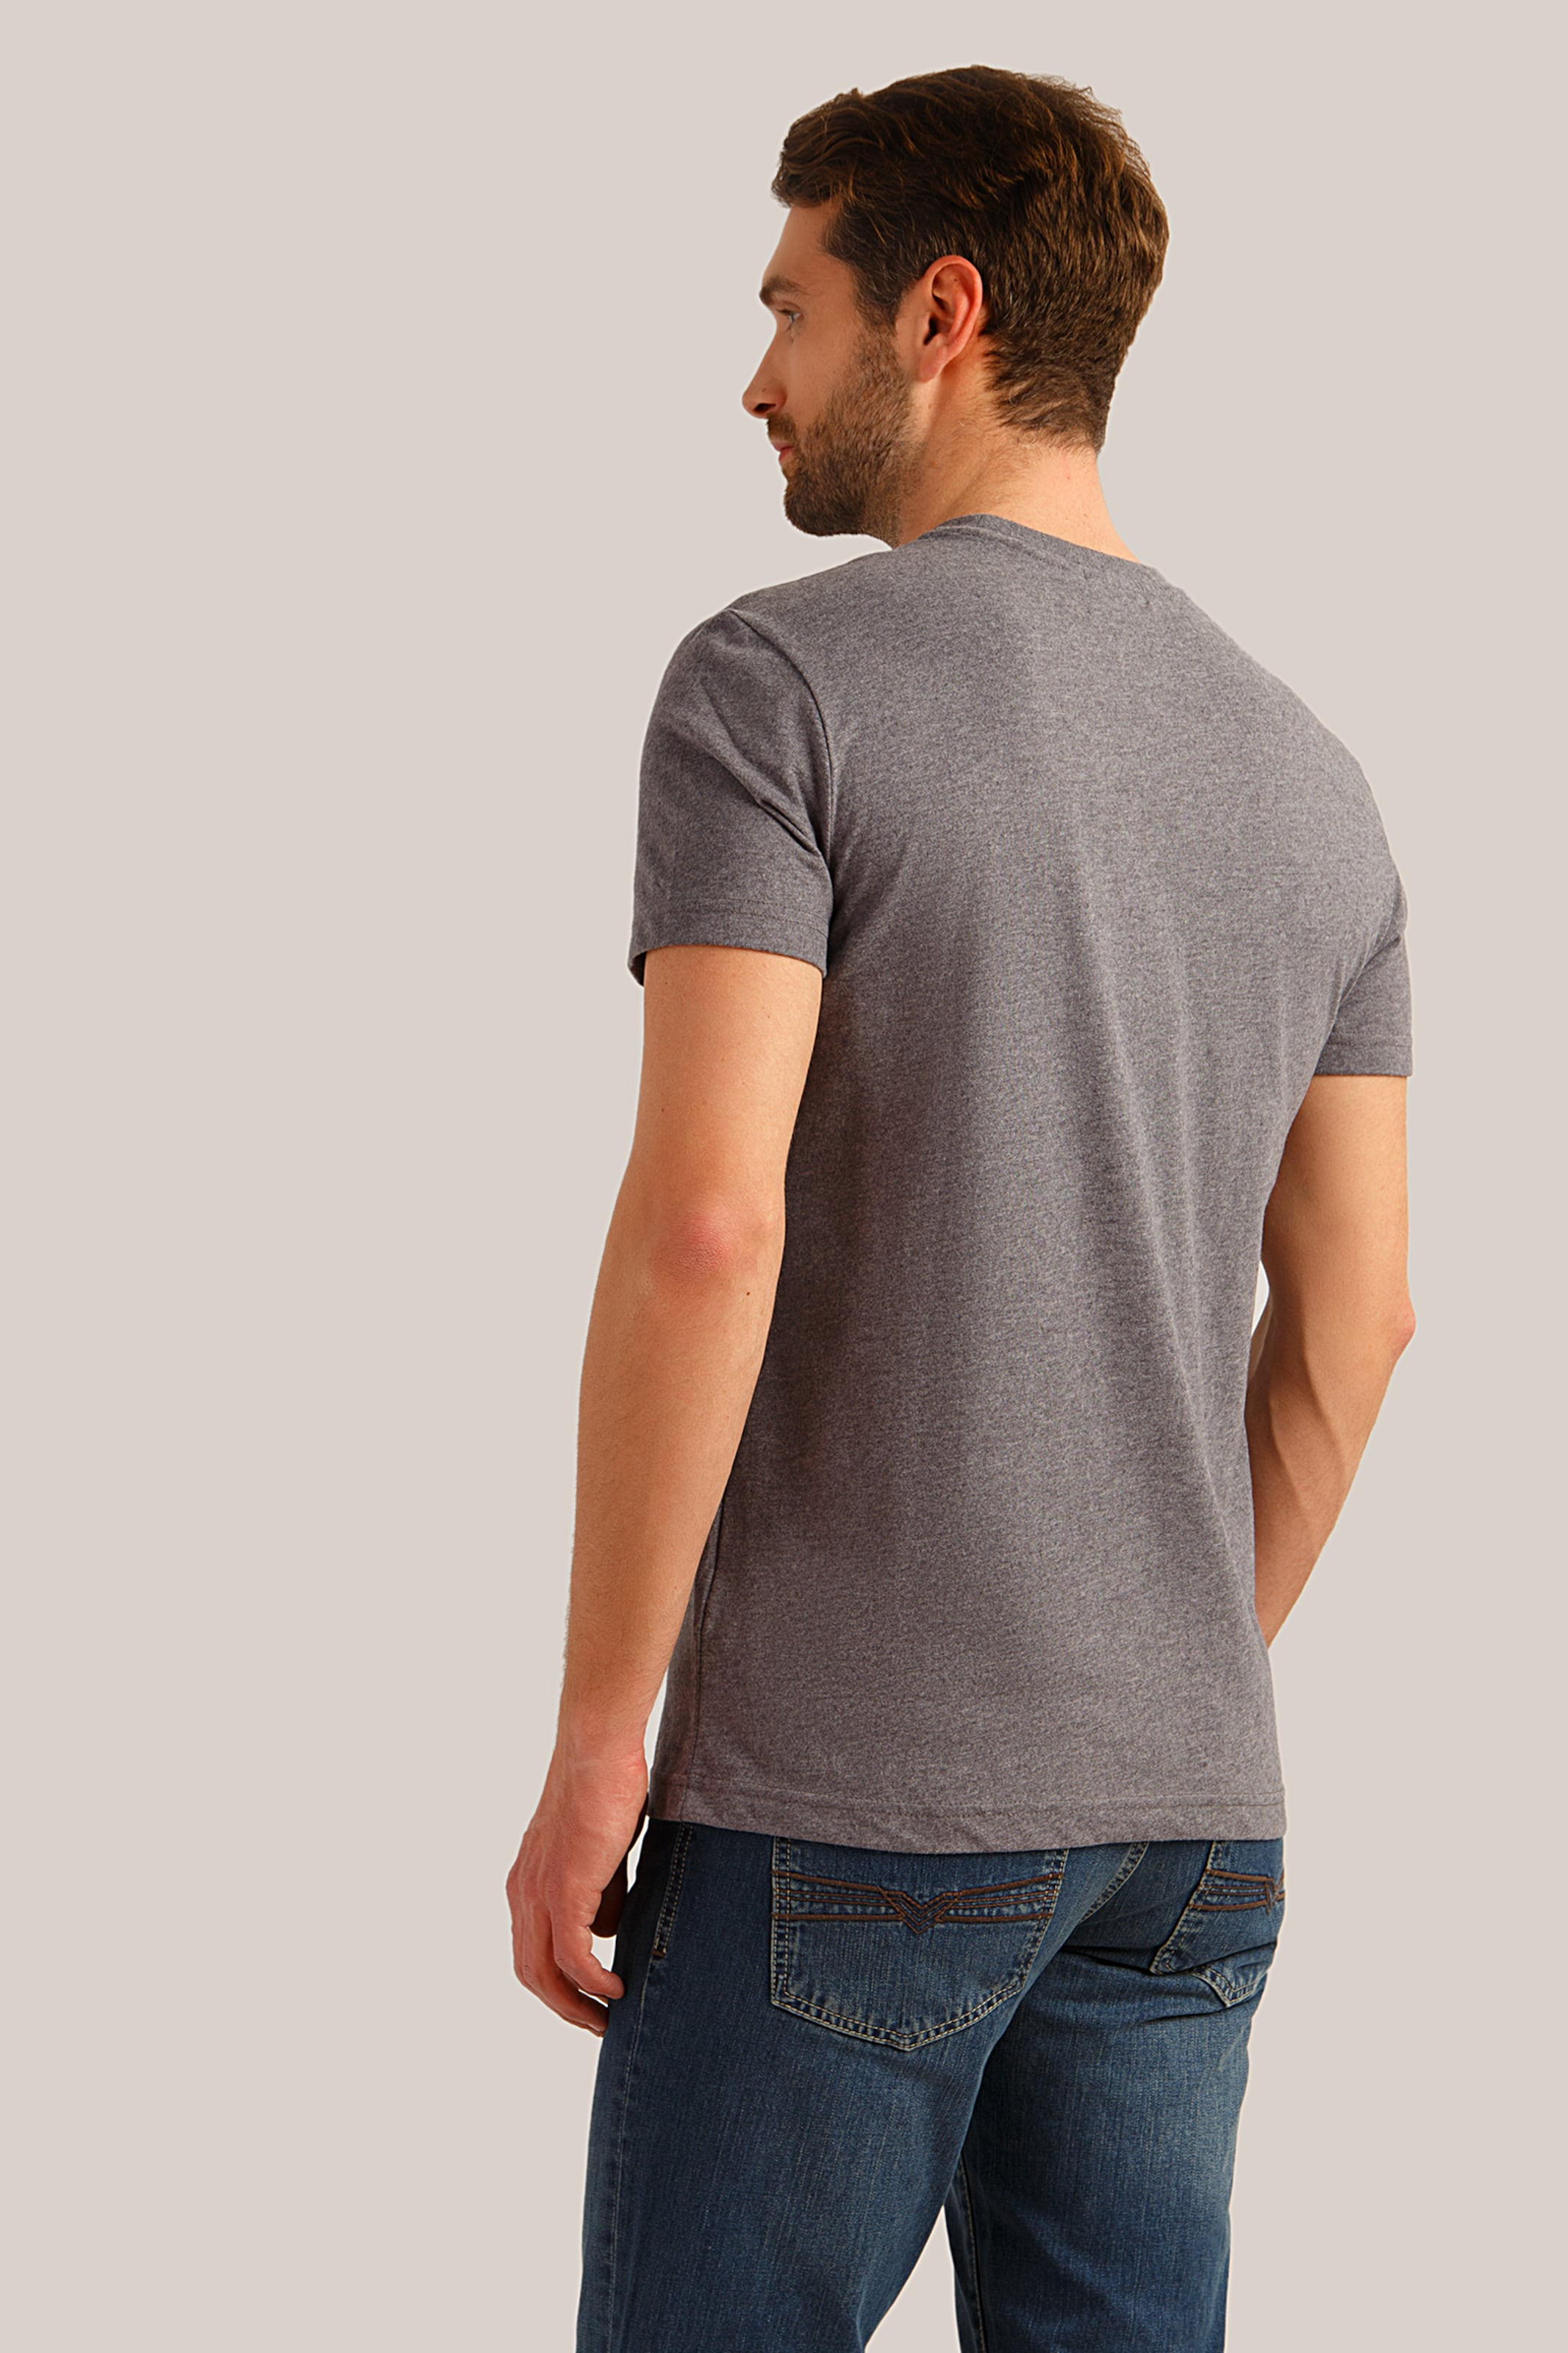 T Finn In shirt Grau Flare 3j54qARL